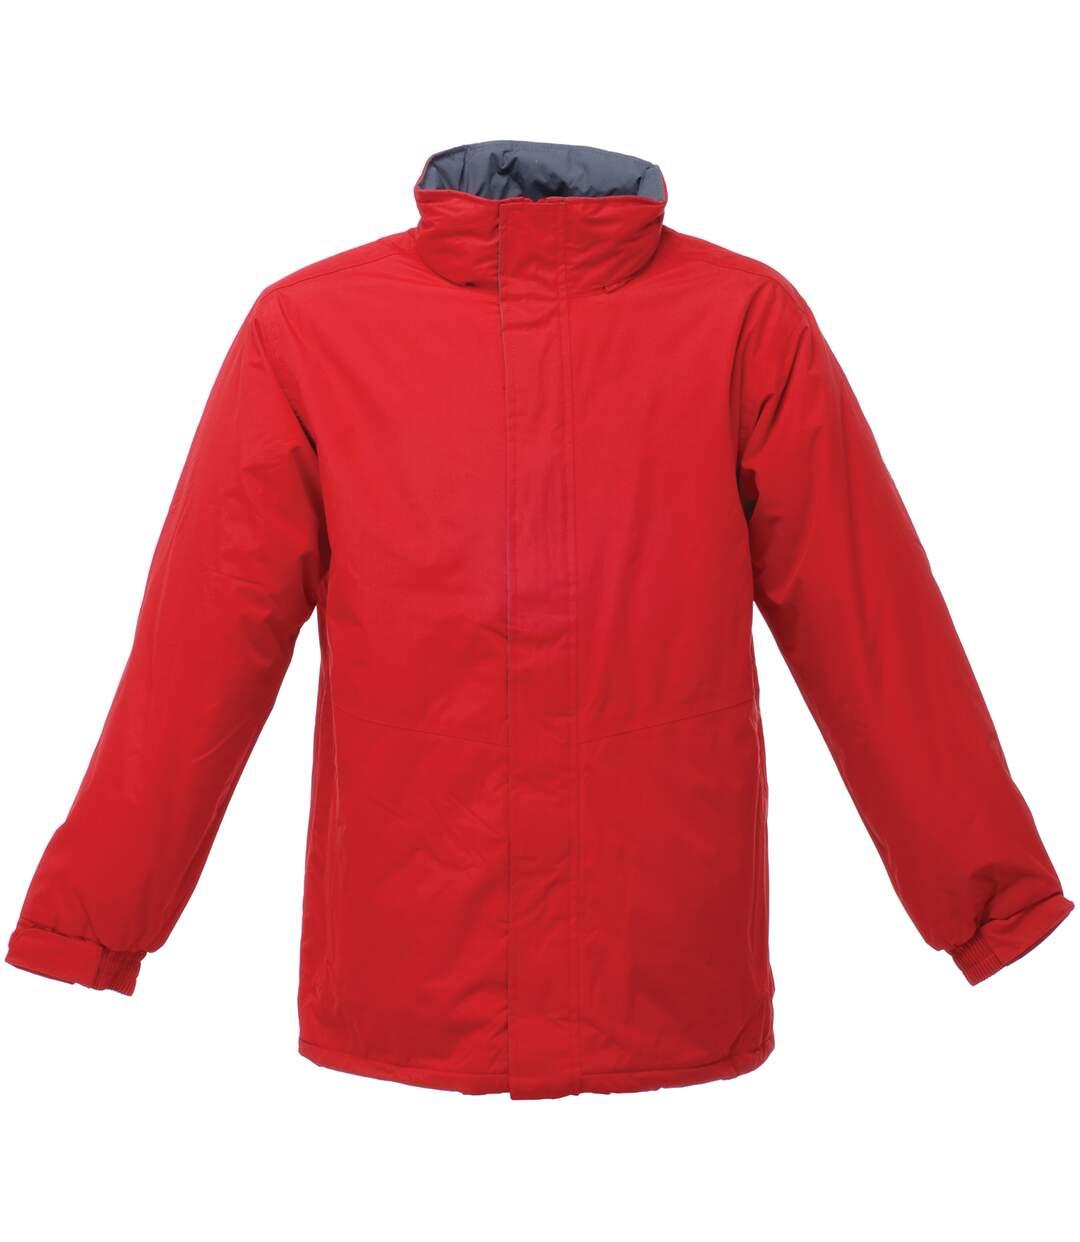 Regatta Mens Beauford Waterproof Windproof Jacket (Thermoguard Insulation) (Classic Red) - UTBC807